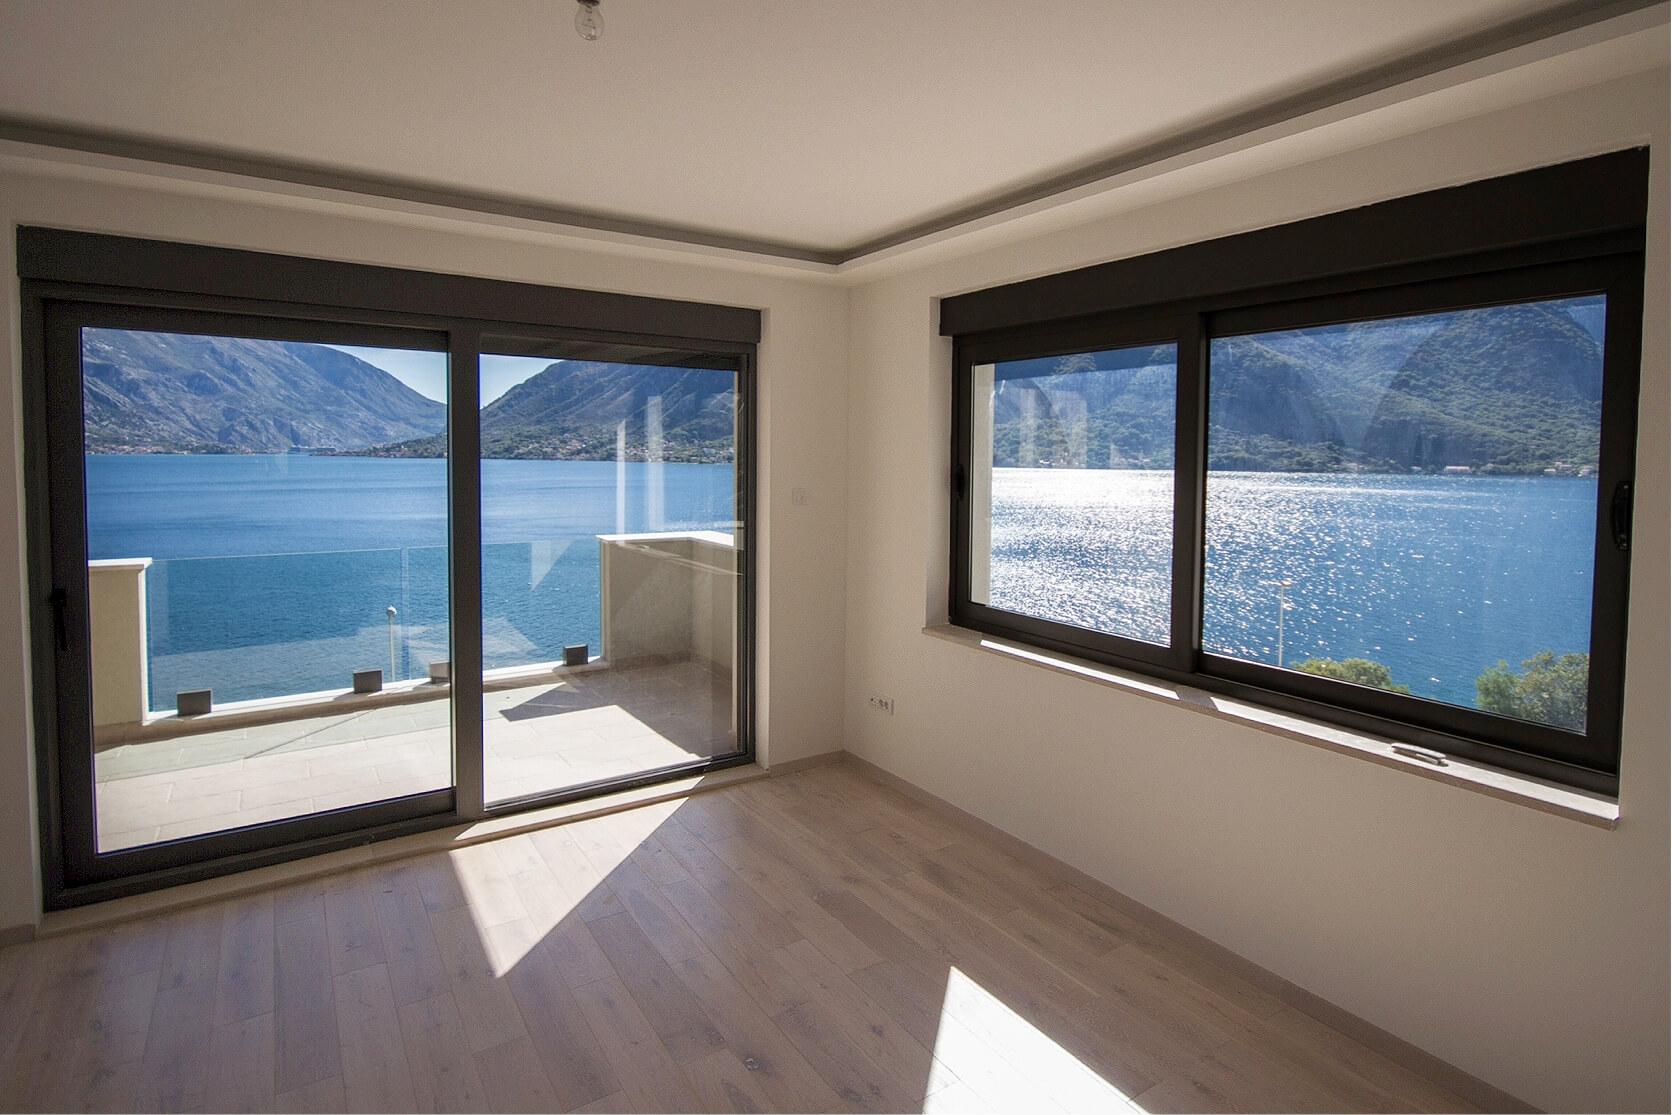 Kotor, Drazin Vrt - luxury two-bedroom apartments, 94m2,  near the sea